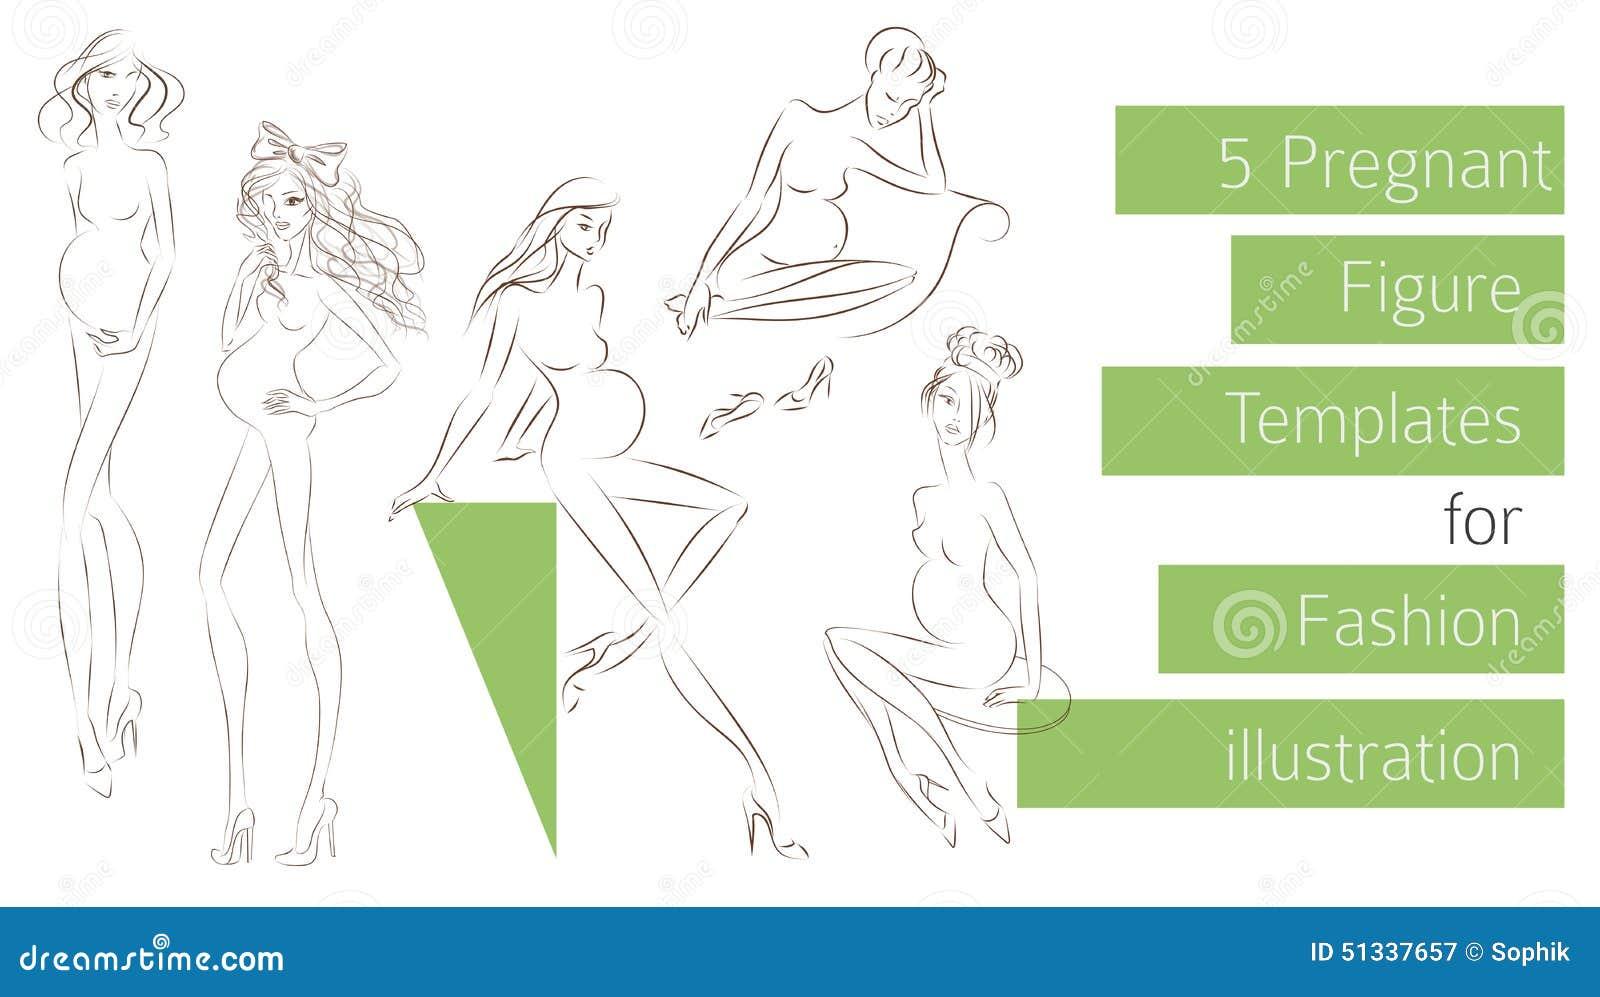 Pregnant Figure Templates For Fashion Illustration Stock ...